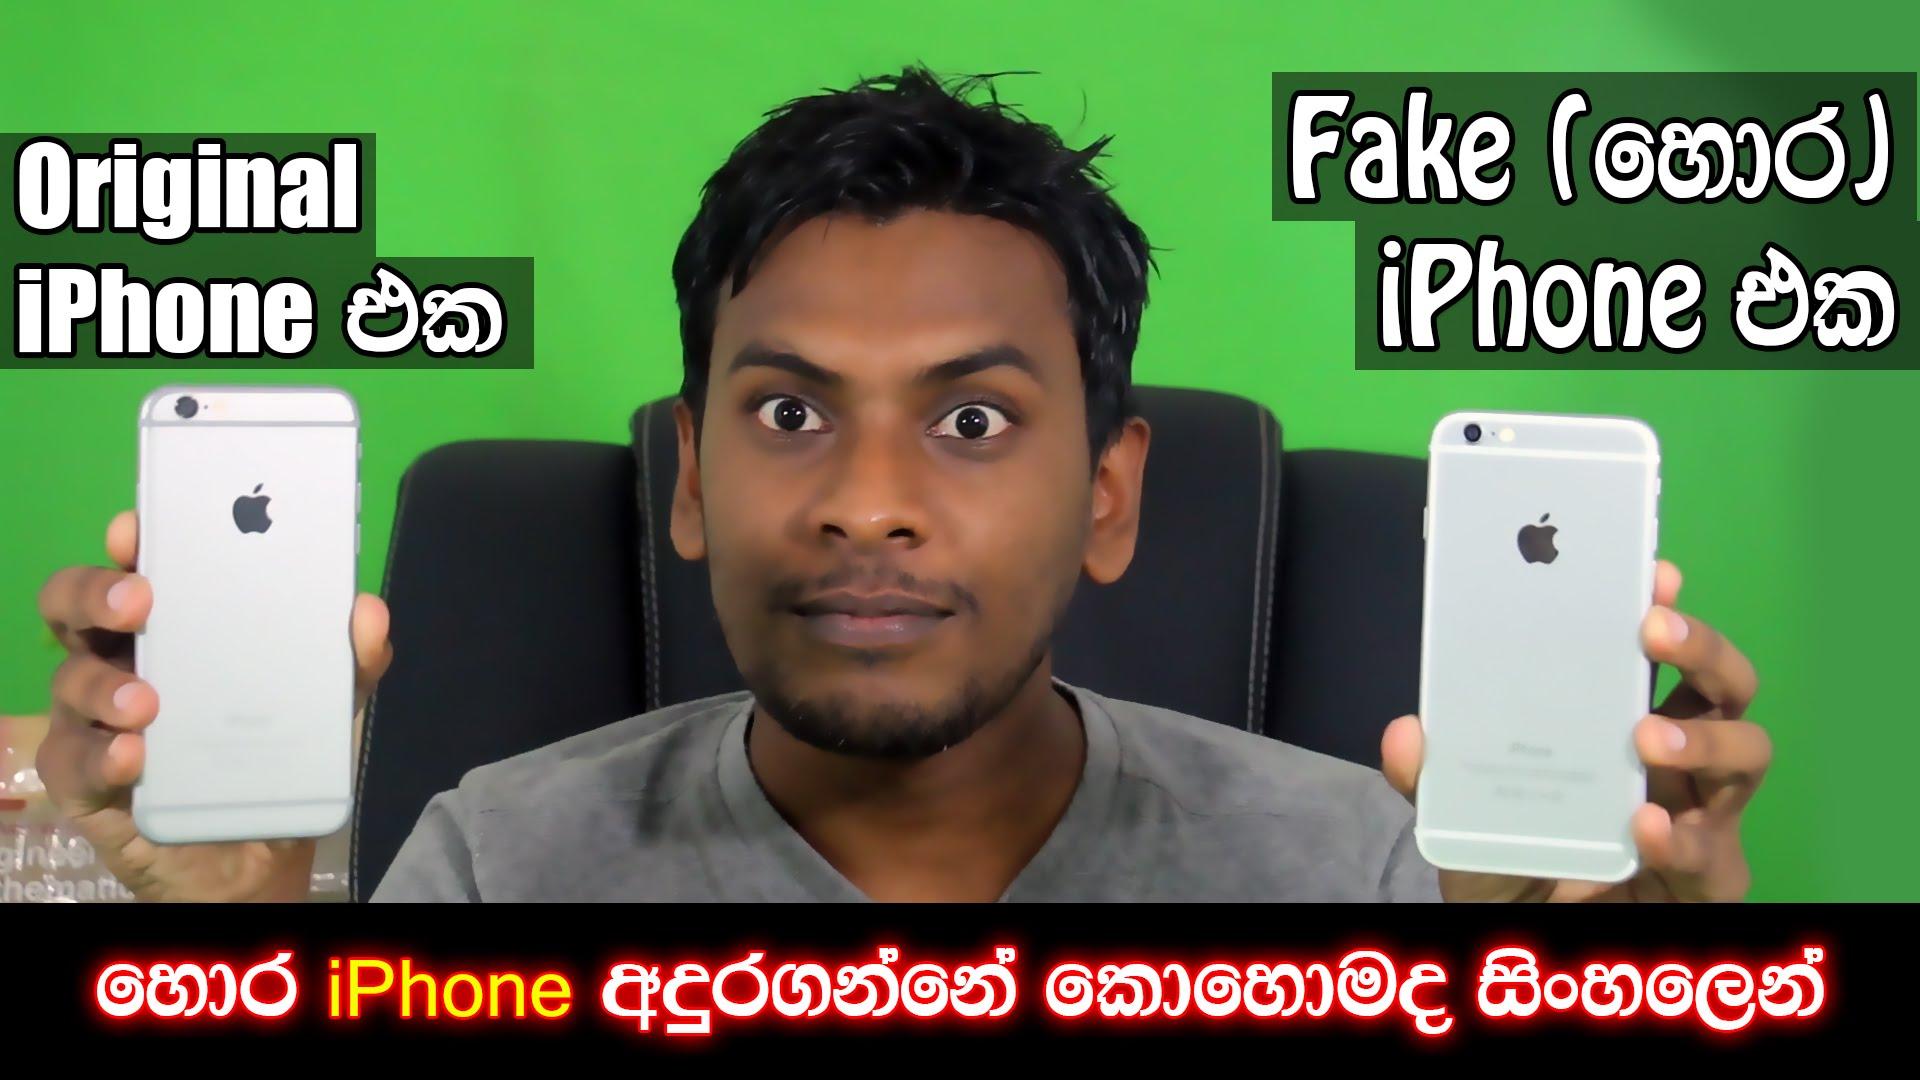 [Video] ඔබගේ iPhone එක Fake එකක්ද Original එකක්ද කියලා හොයාගන්නේ කොහමද?